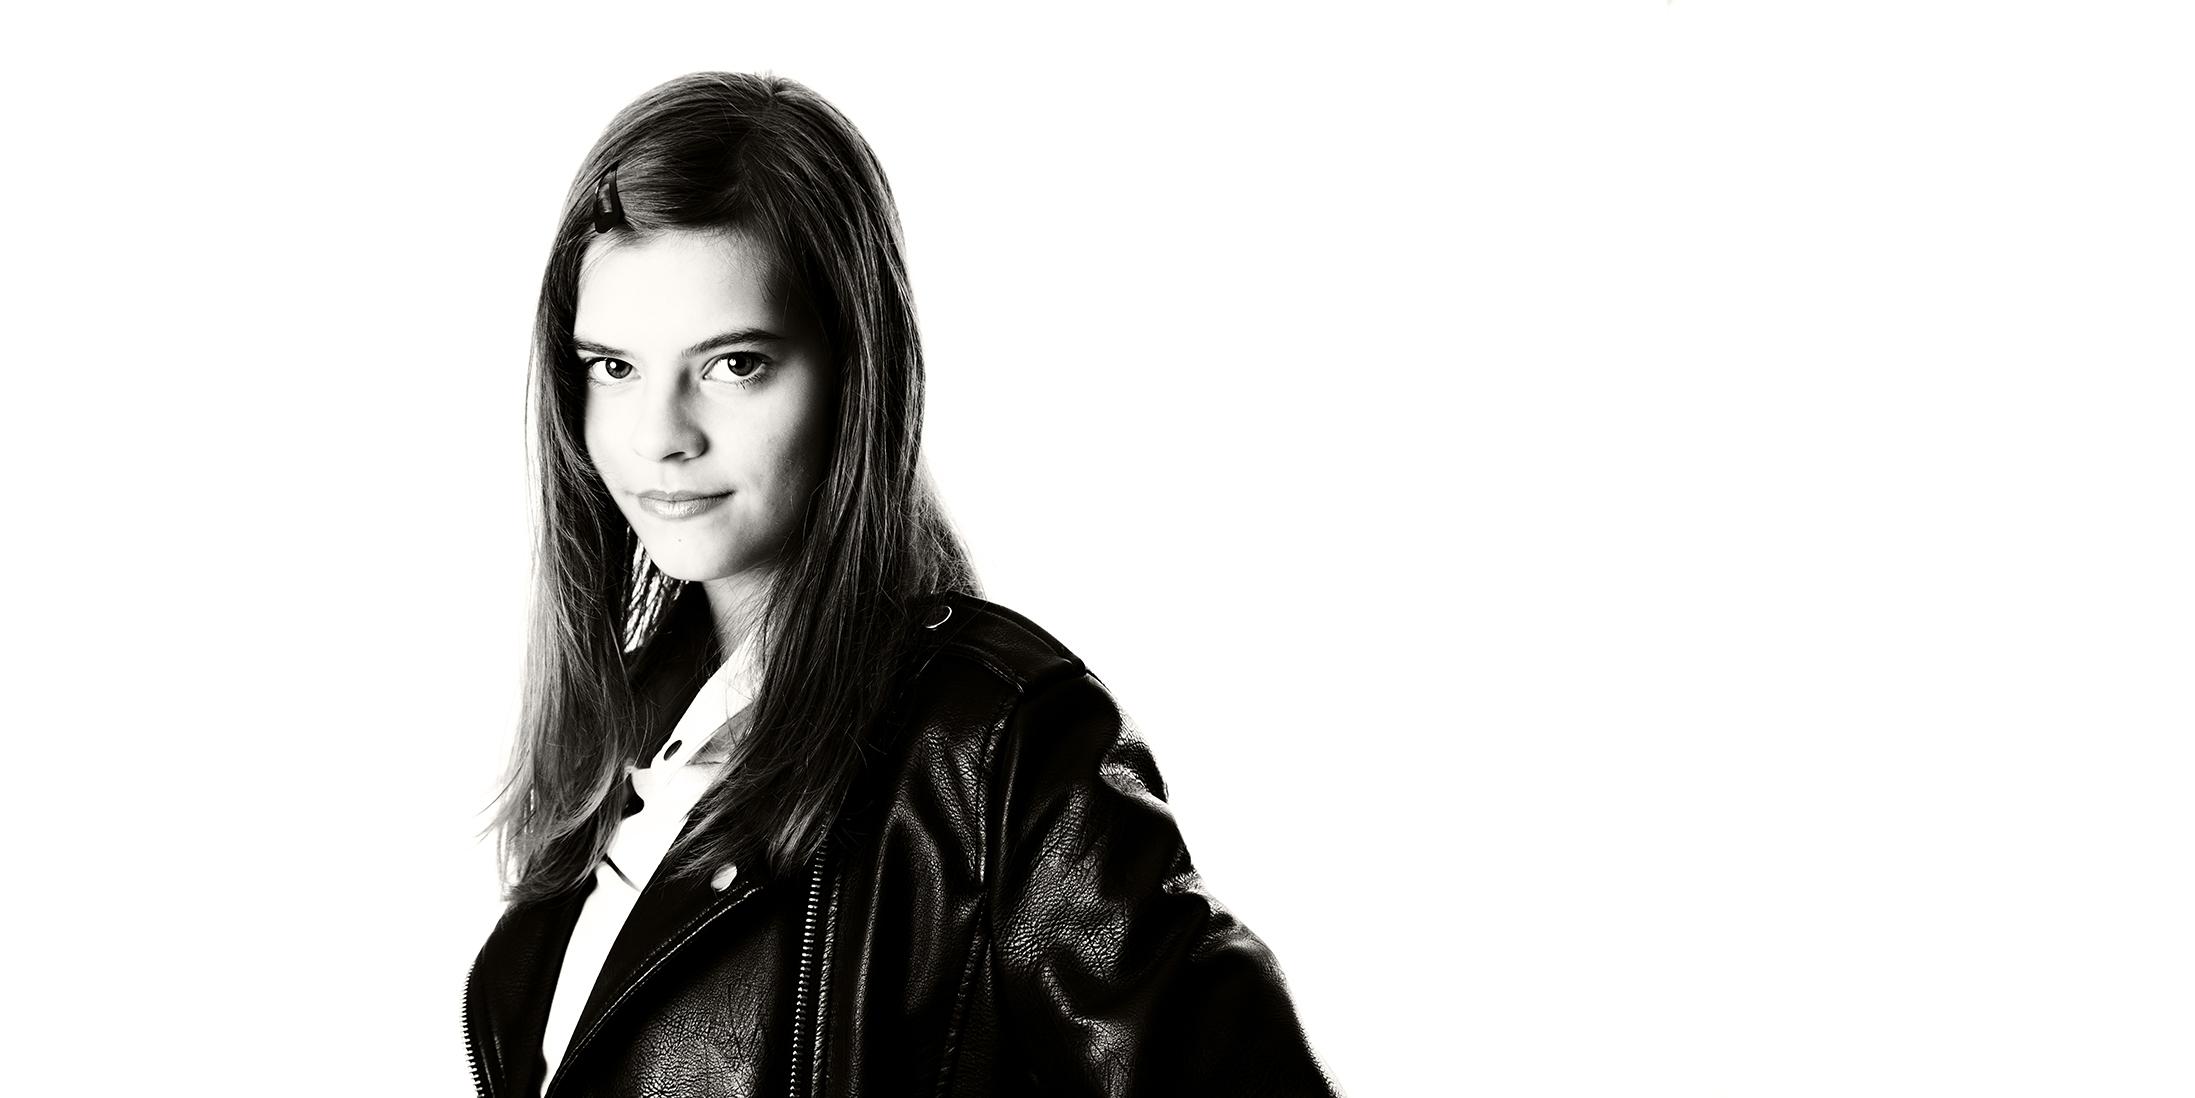 portret studio professioneel shoot